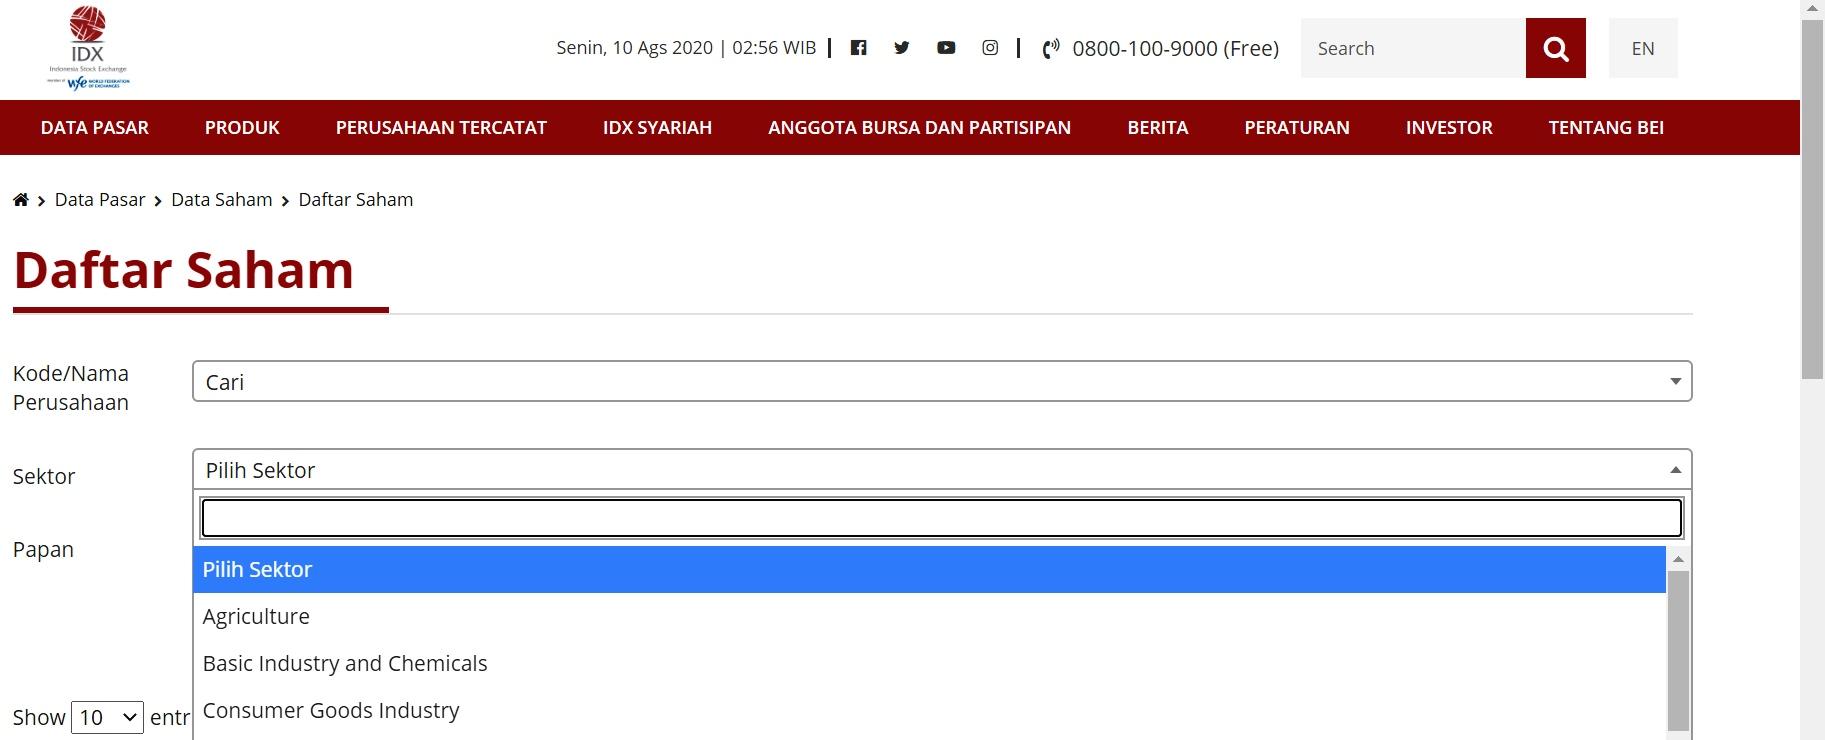 Sektor Saham di Bursa Efek Indonesia/BEI